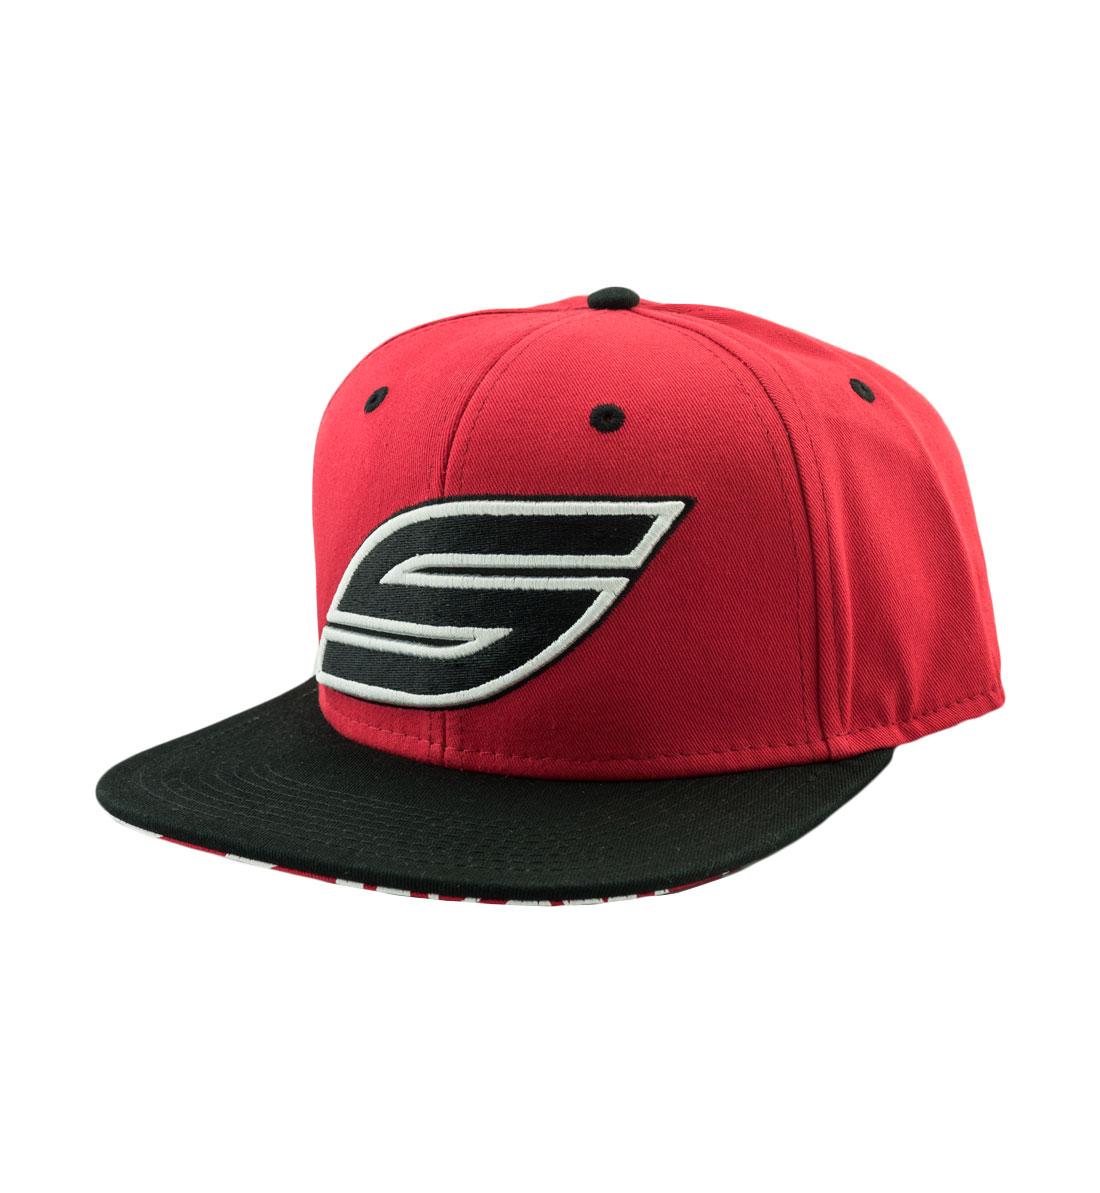 f789e1176 Snapback Hat, Red Black, Black S